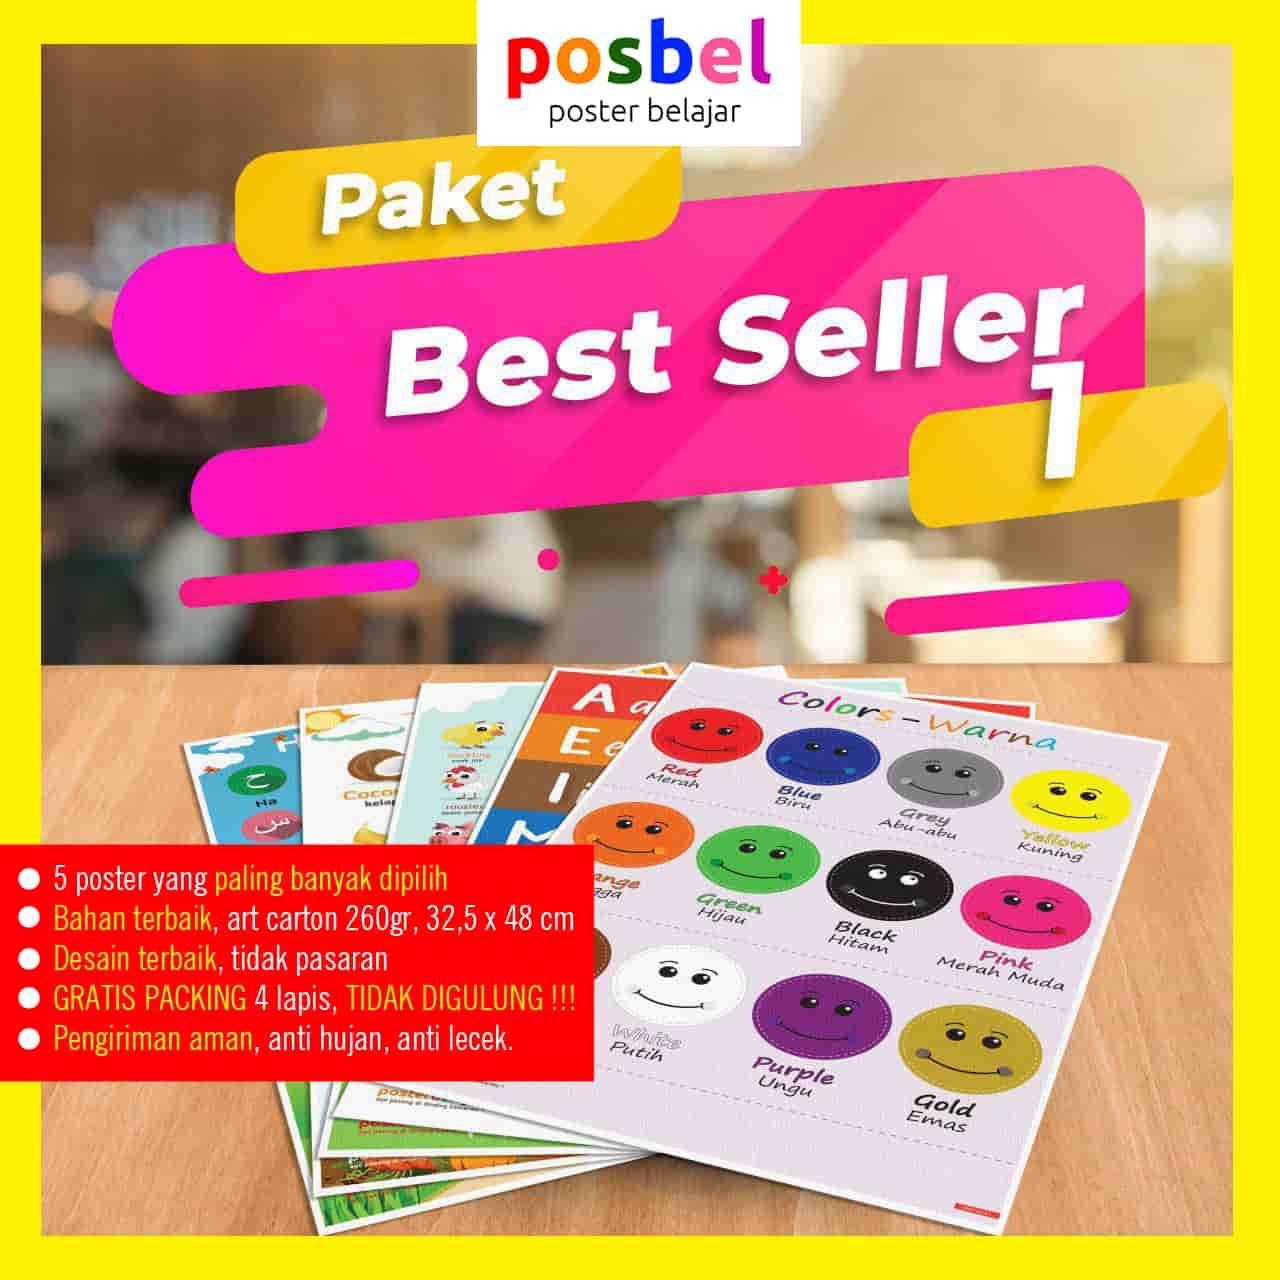 bingkai POSBEL paket best seller 1 poster belajar mainan anak edukatif edukasi bahasa inggris alat peraga-min